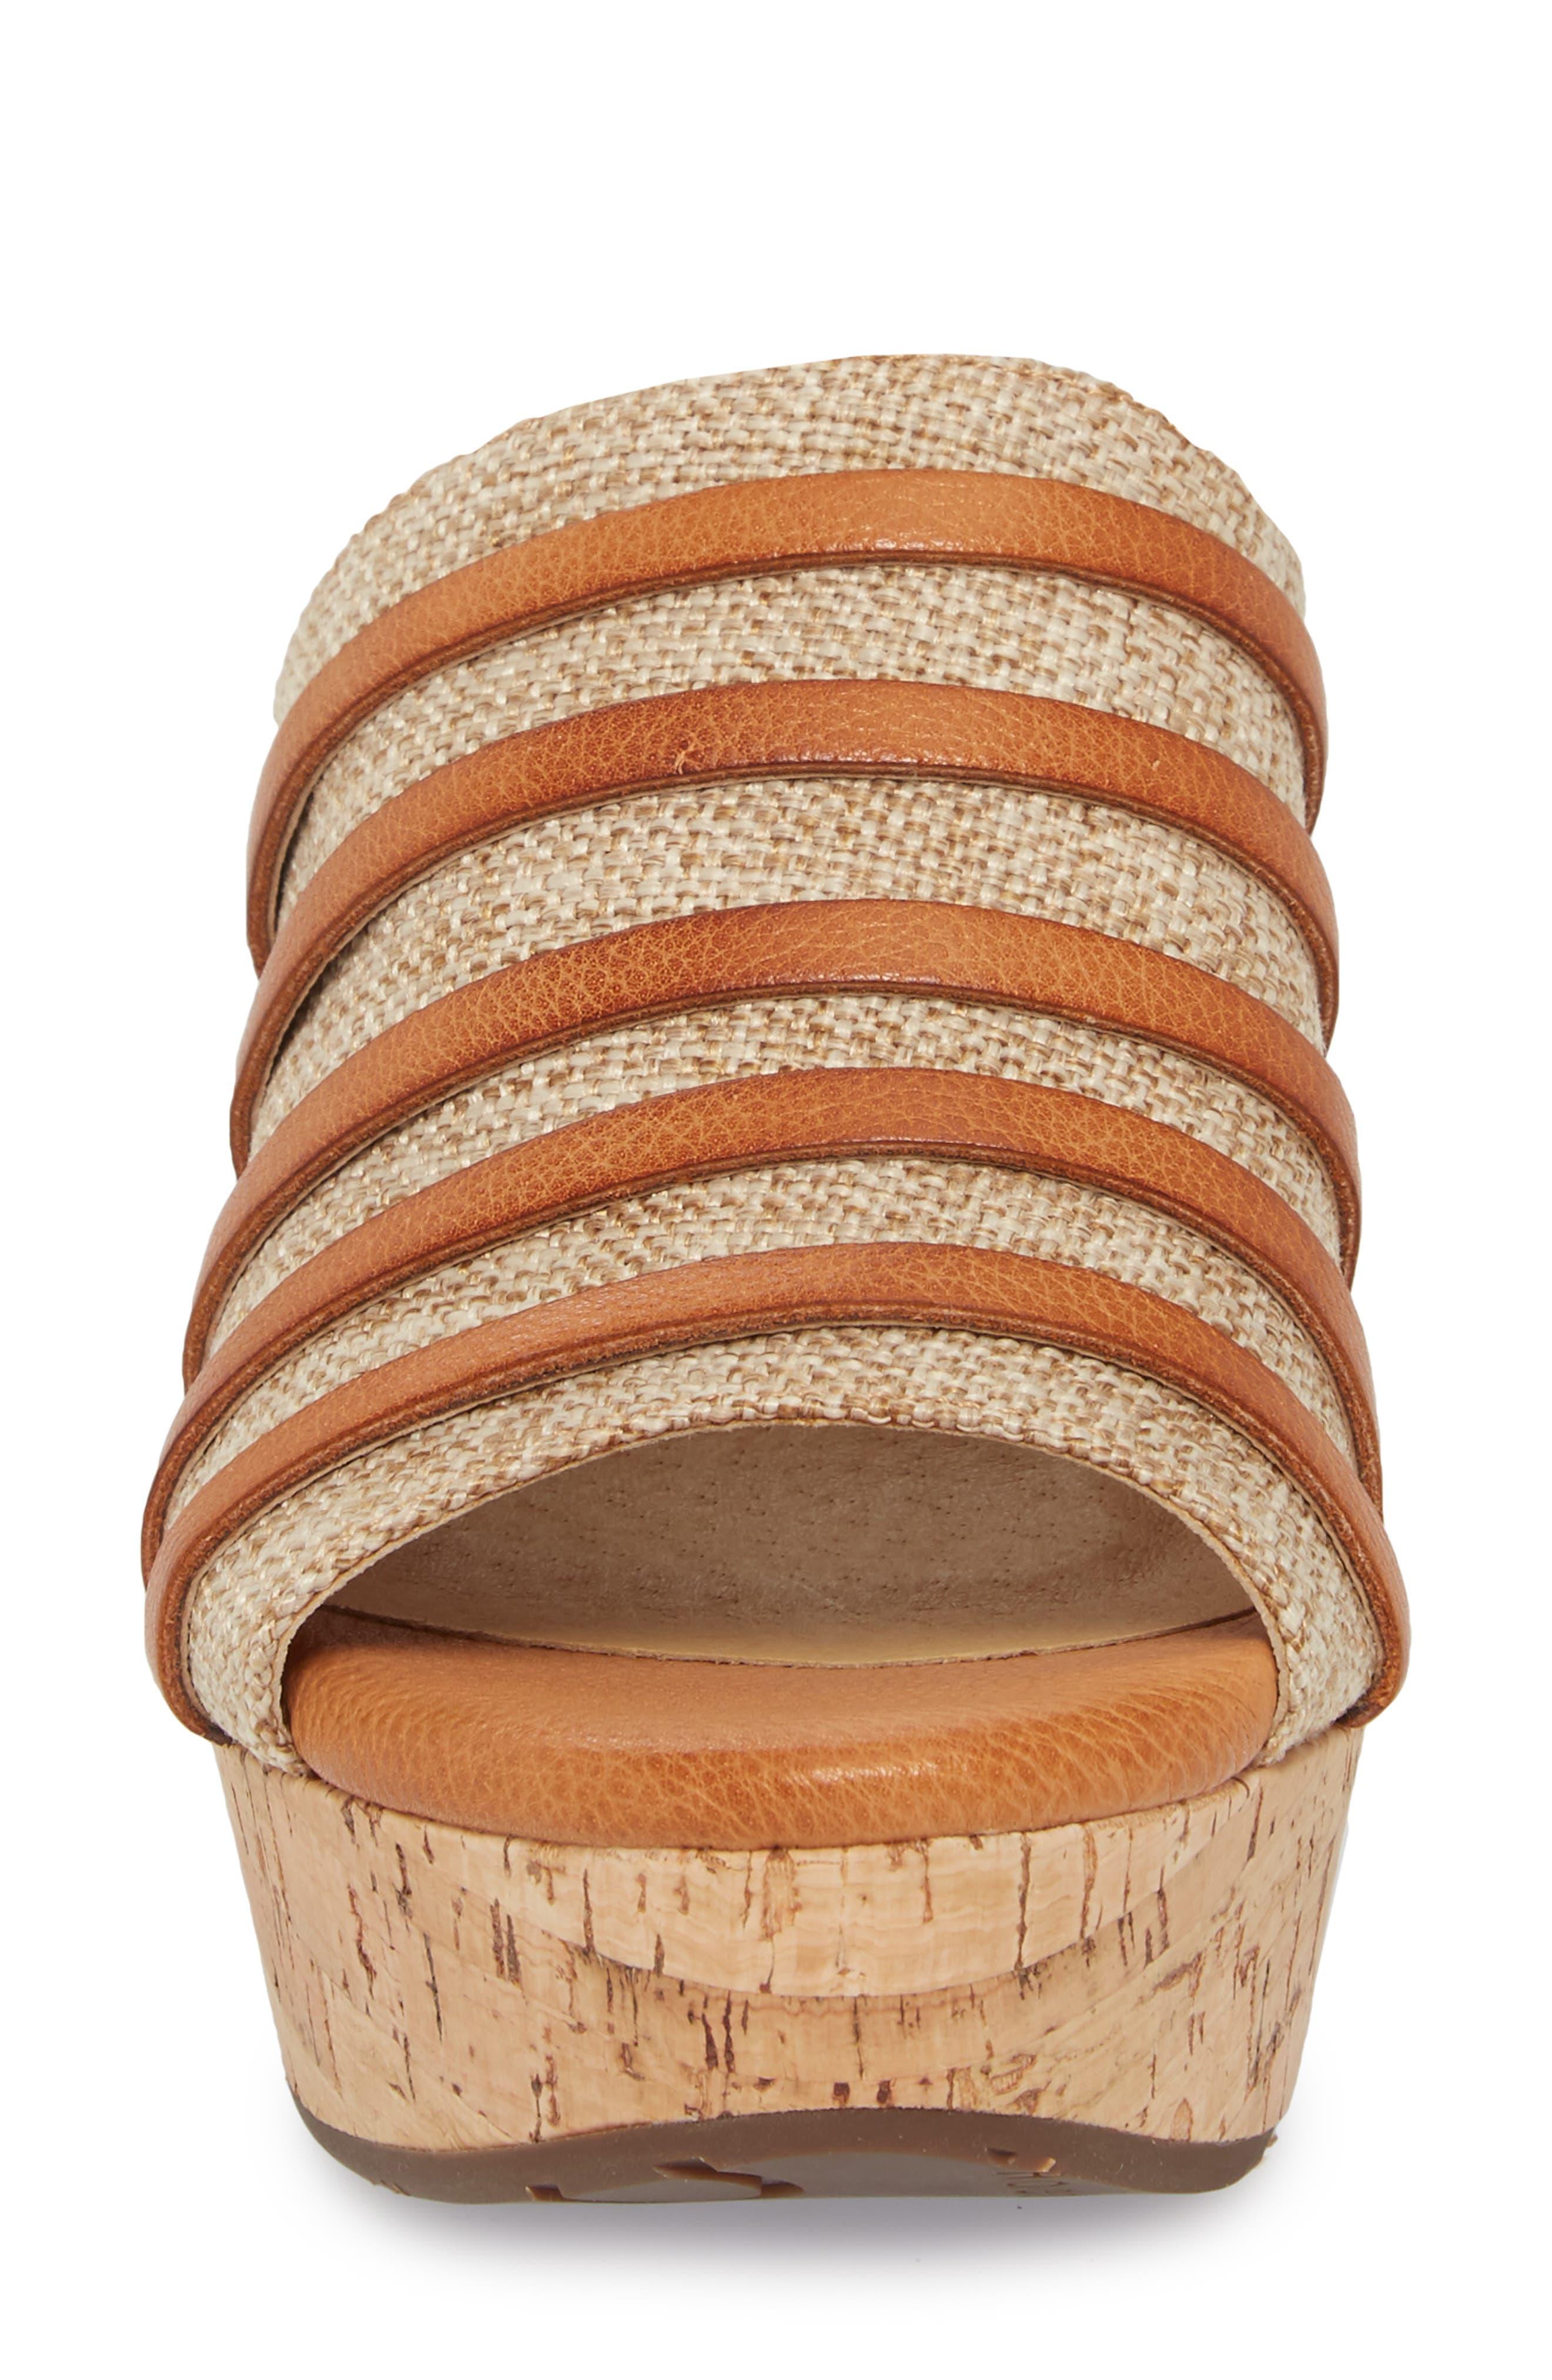 Wapi Wedge Sandal,                             Alternate thumbnail 4, color,                             Camel Leather